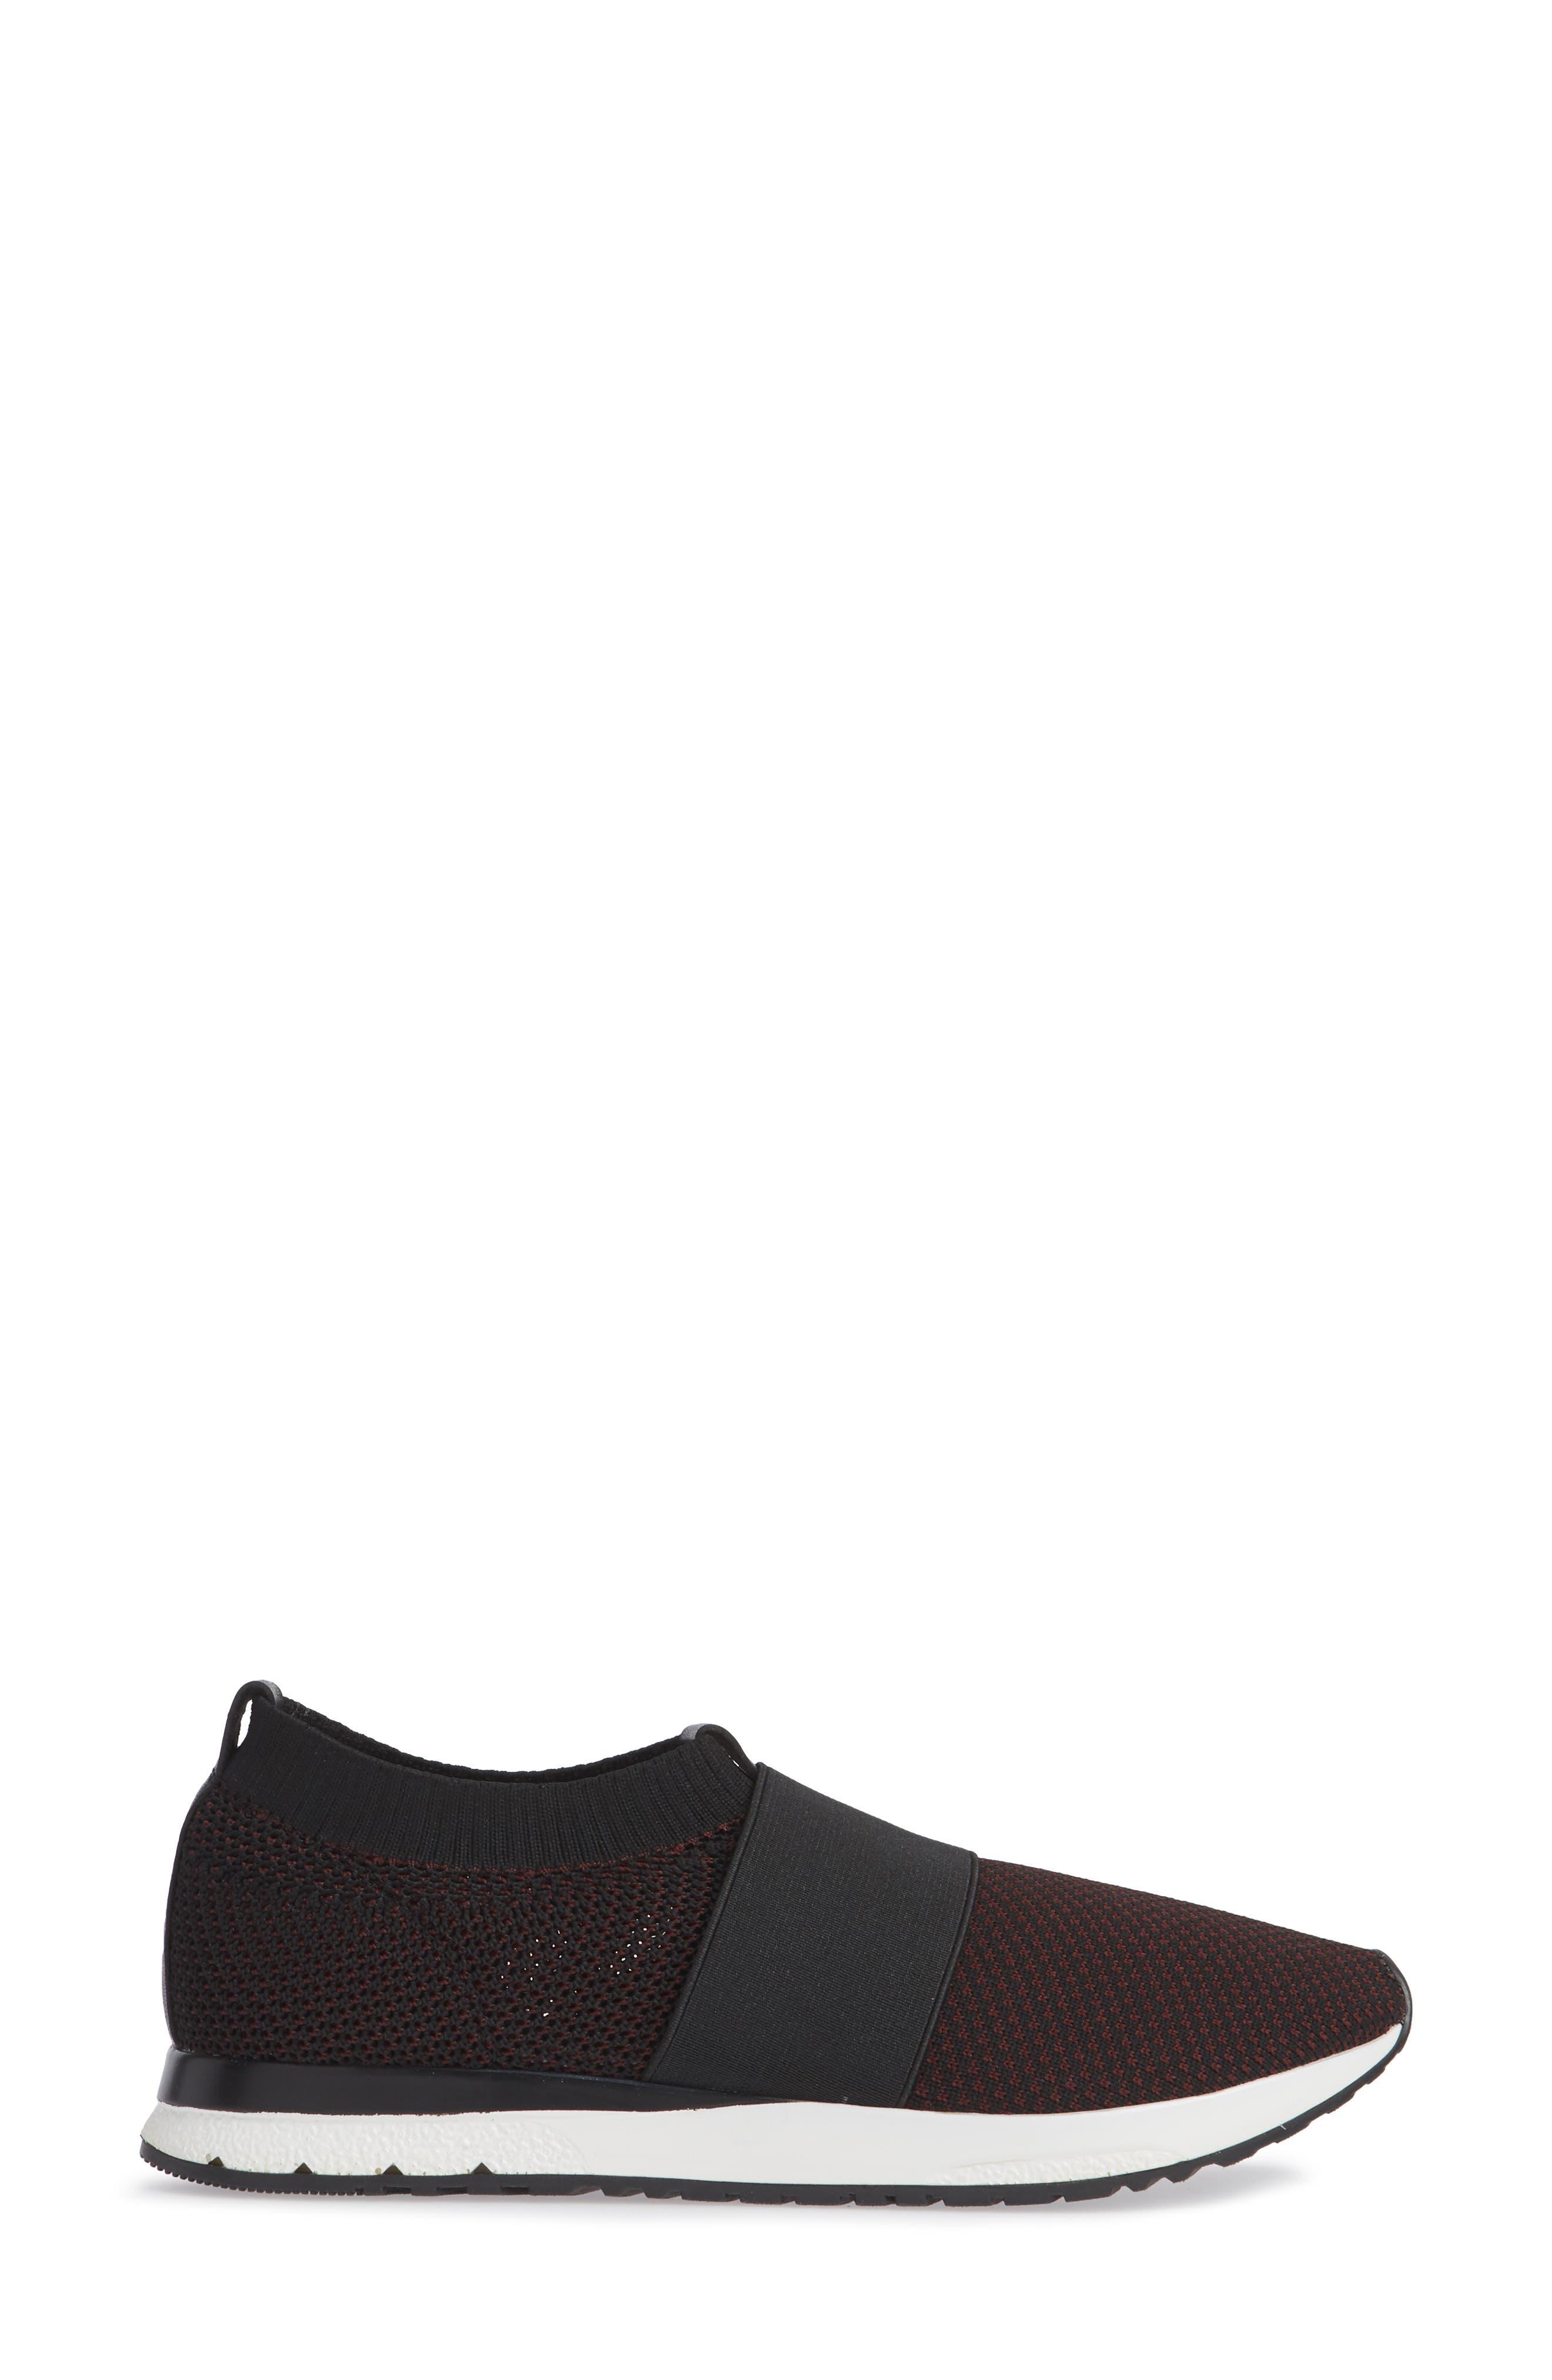 Brooke Slip-On Sneaker,                             Alternate thumbnail 5, color,                             Black/ Wine Knit Fabric